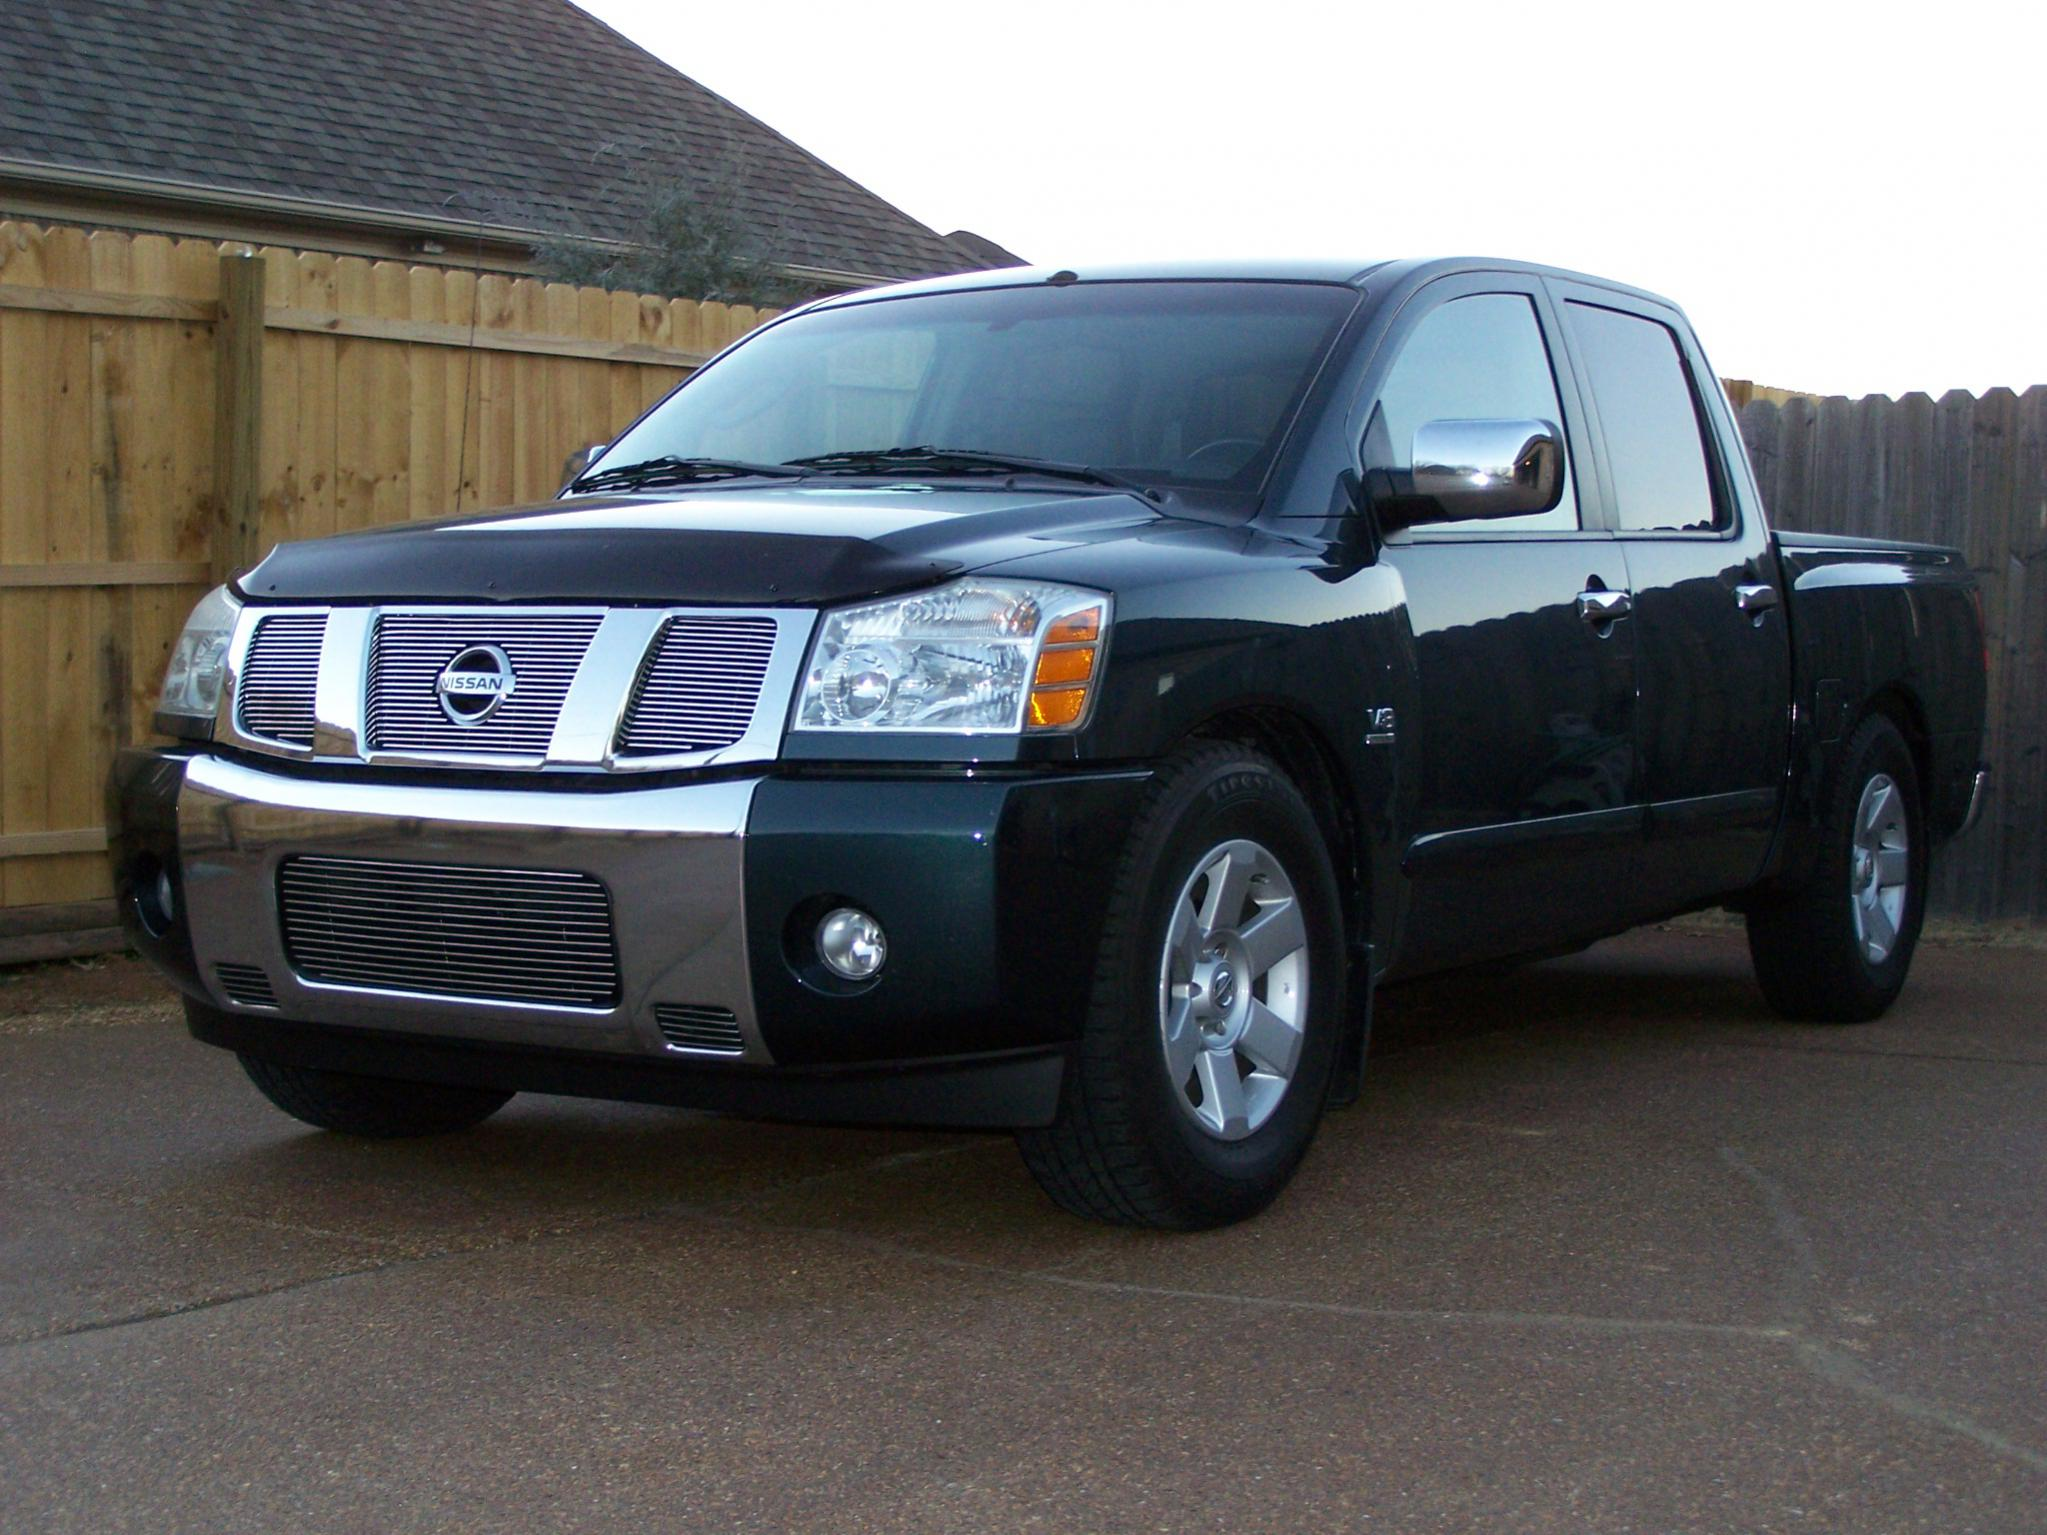 D Wtb Looking Buy Nissan Titan Crew Cab Lowered Titan